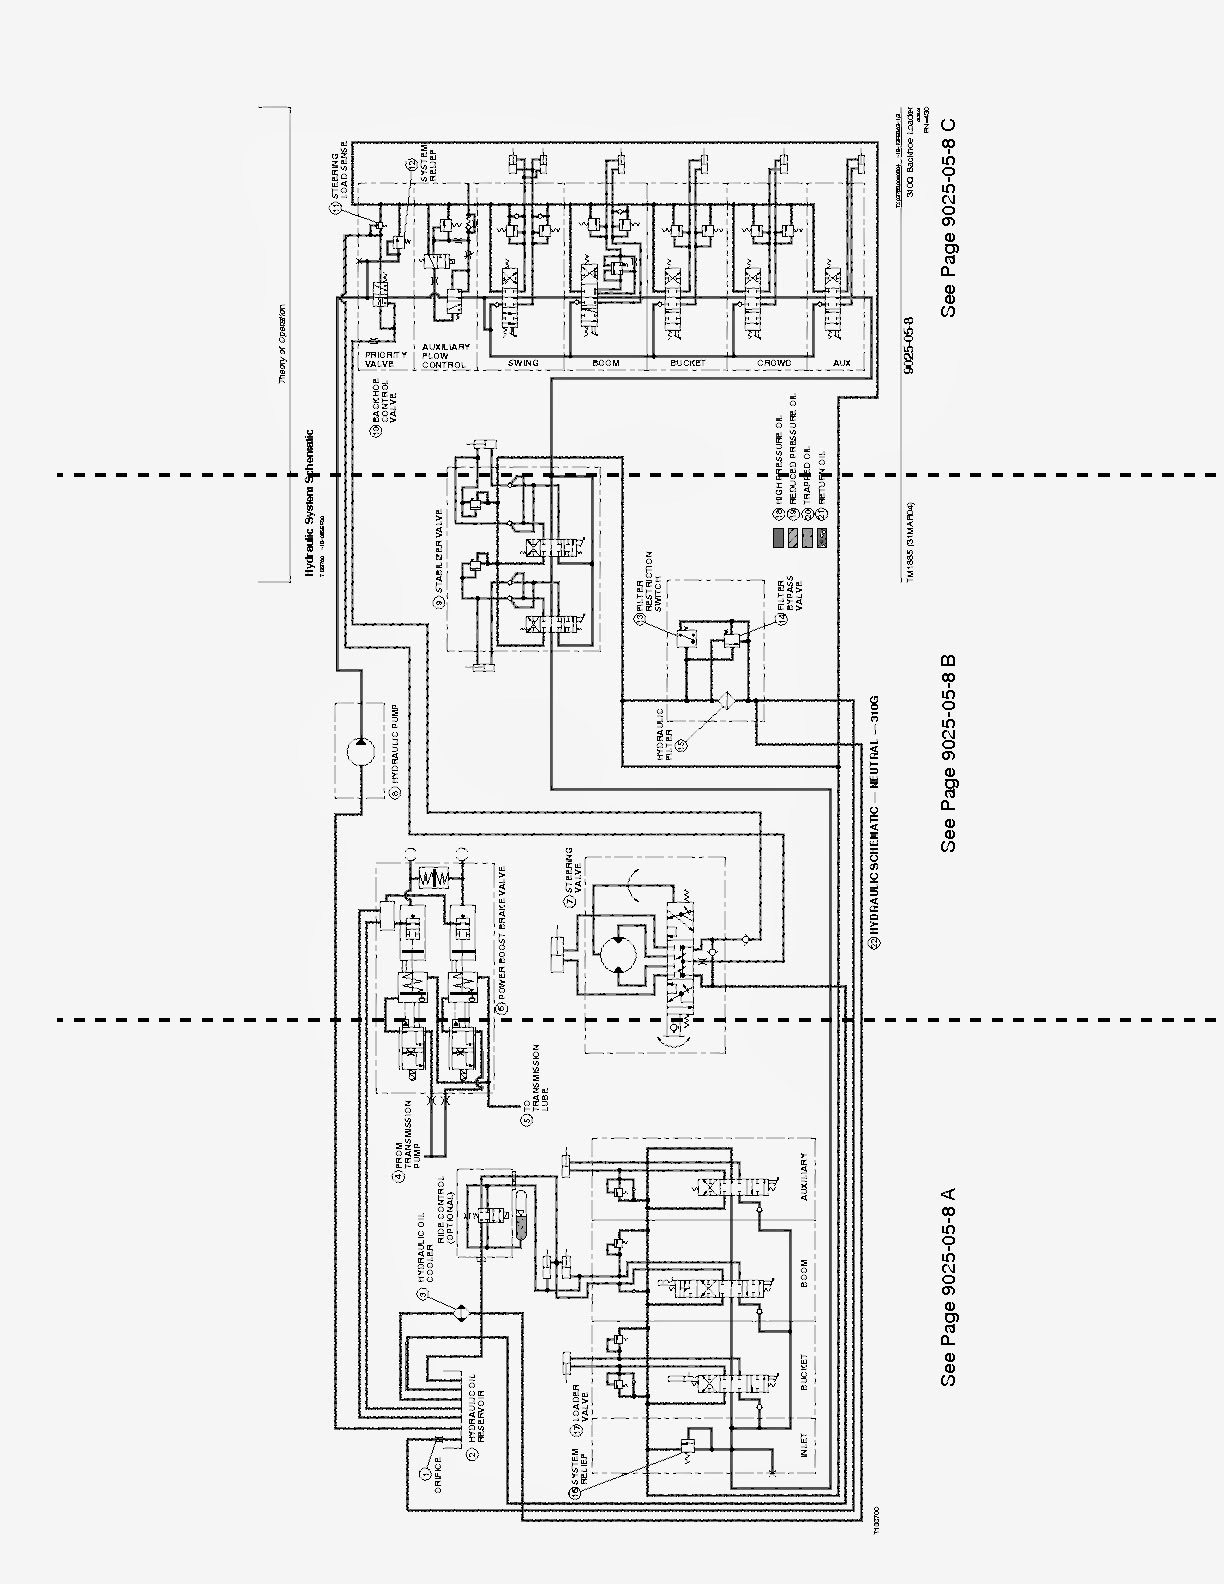 2003 harley road king wiring diagram 1975 davidson sportster fatboy html